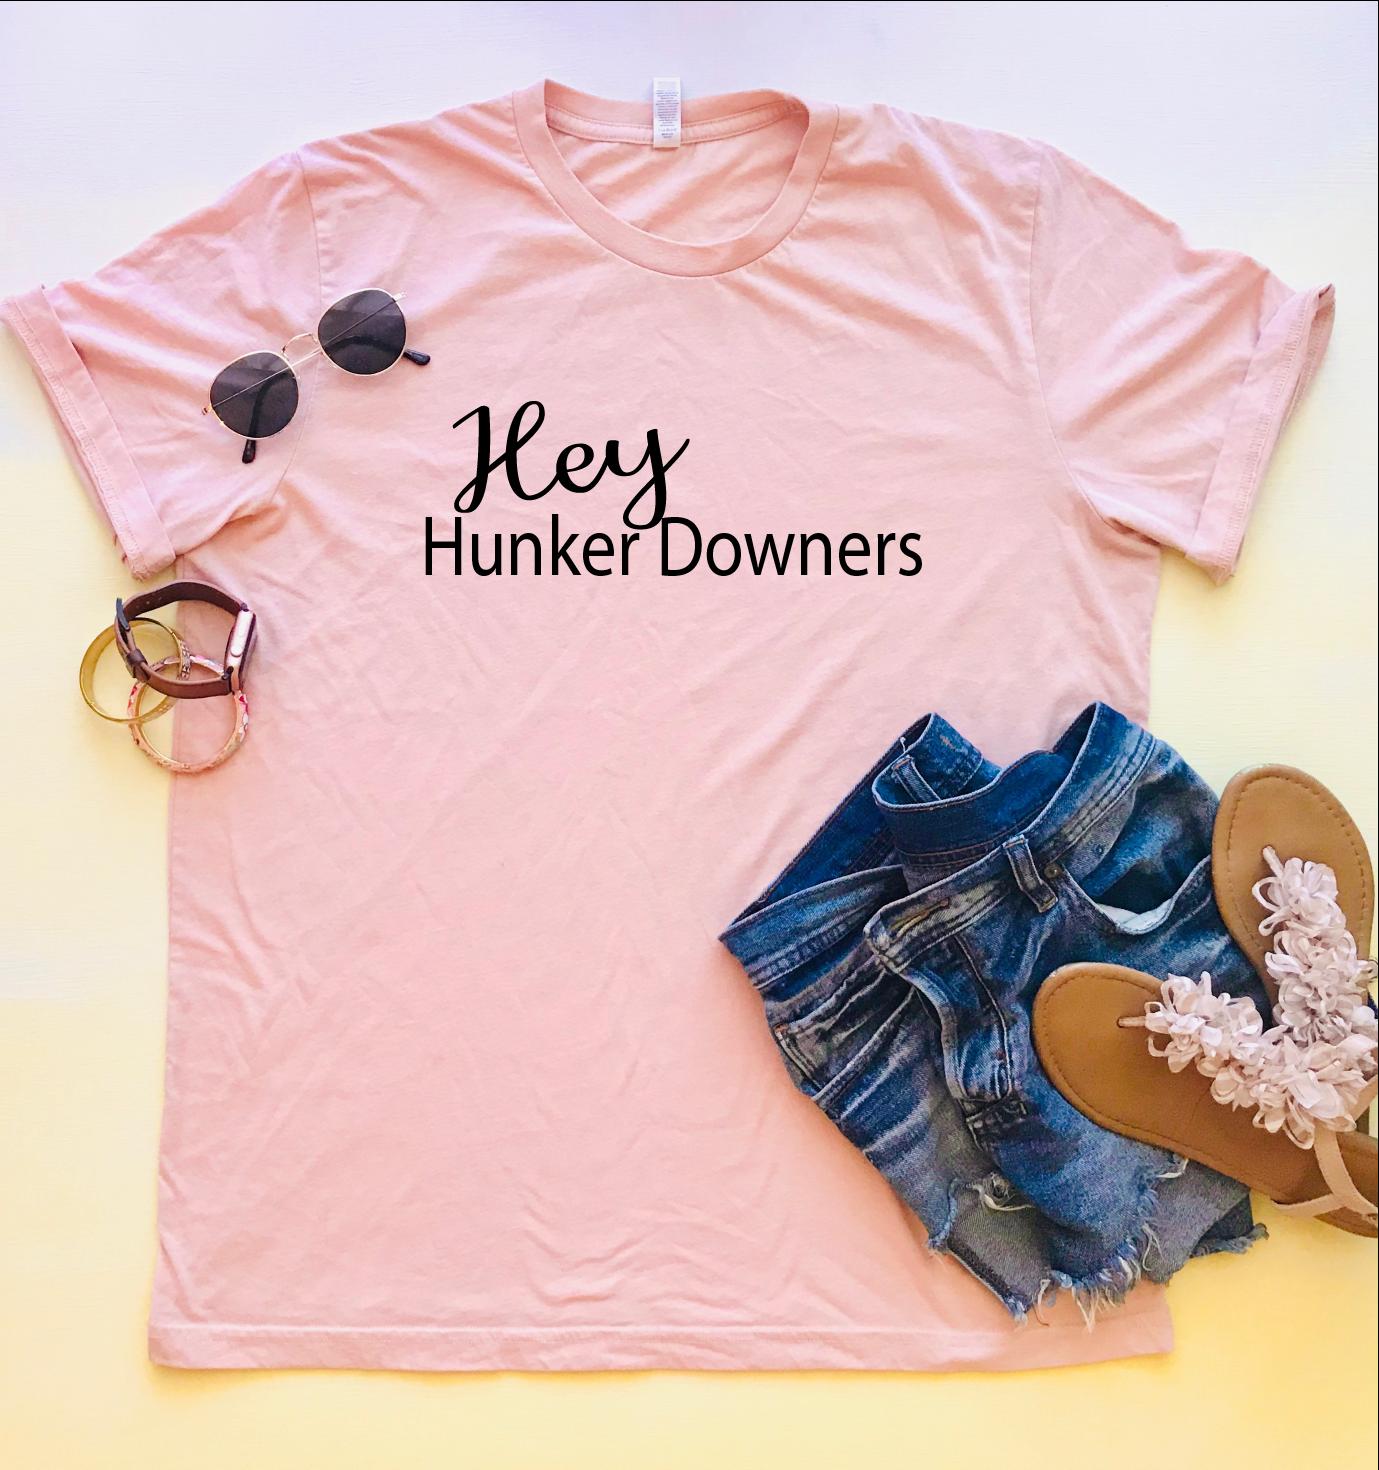 Hey Hunker Downers Tee